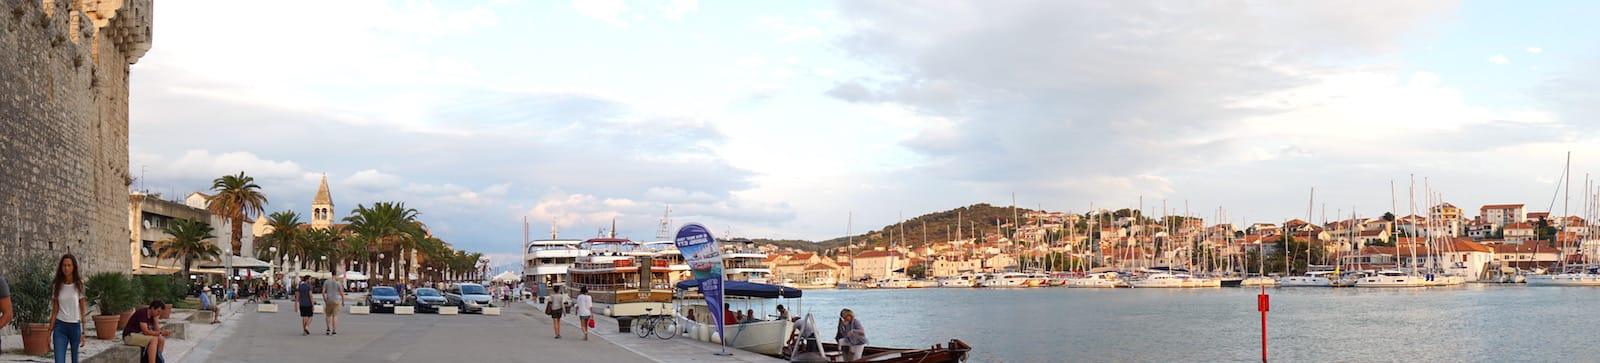 Reiselust-Mag: Trogir, Altstadthafen. Foto: Beate Ziehres